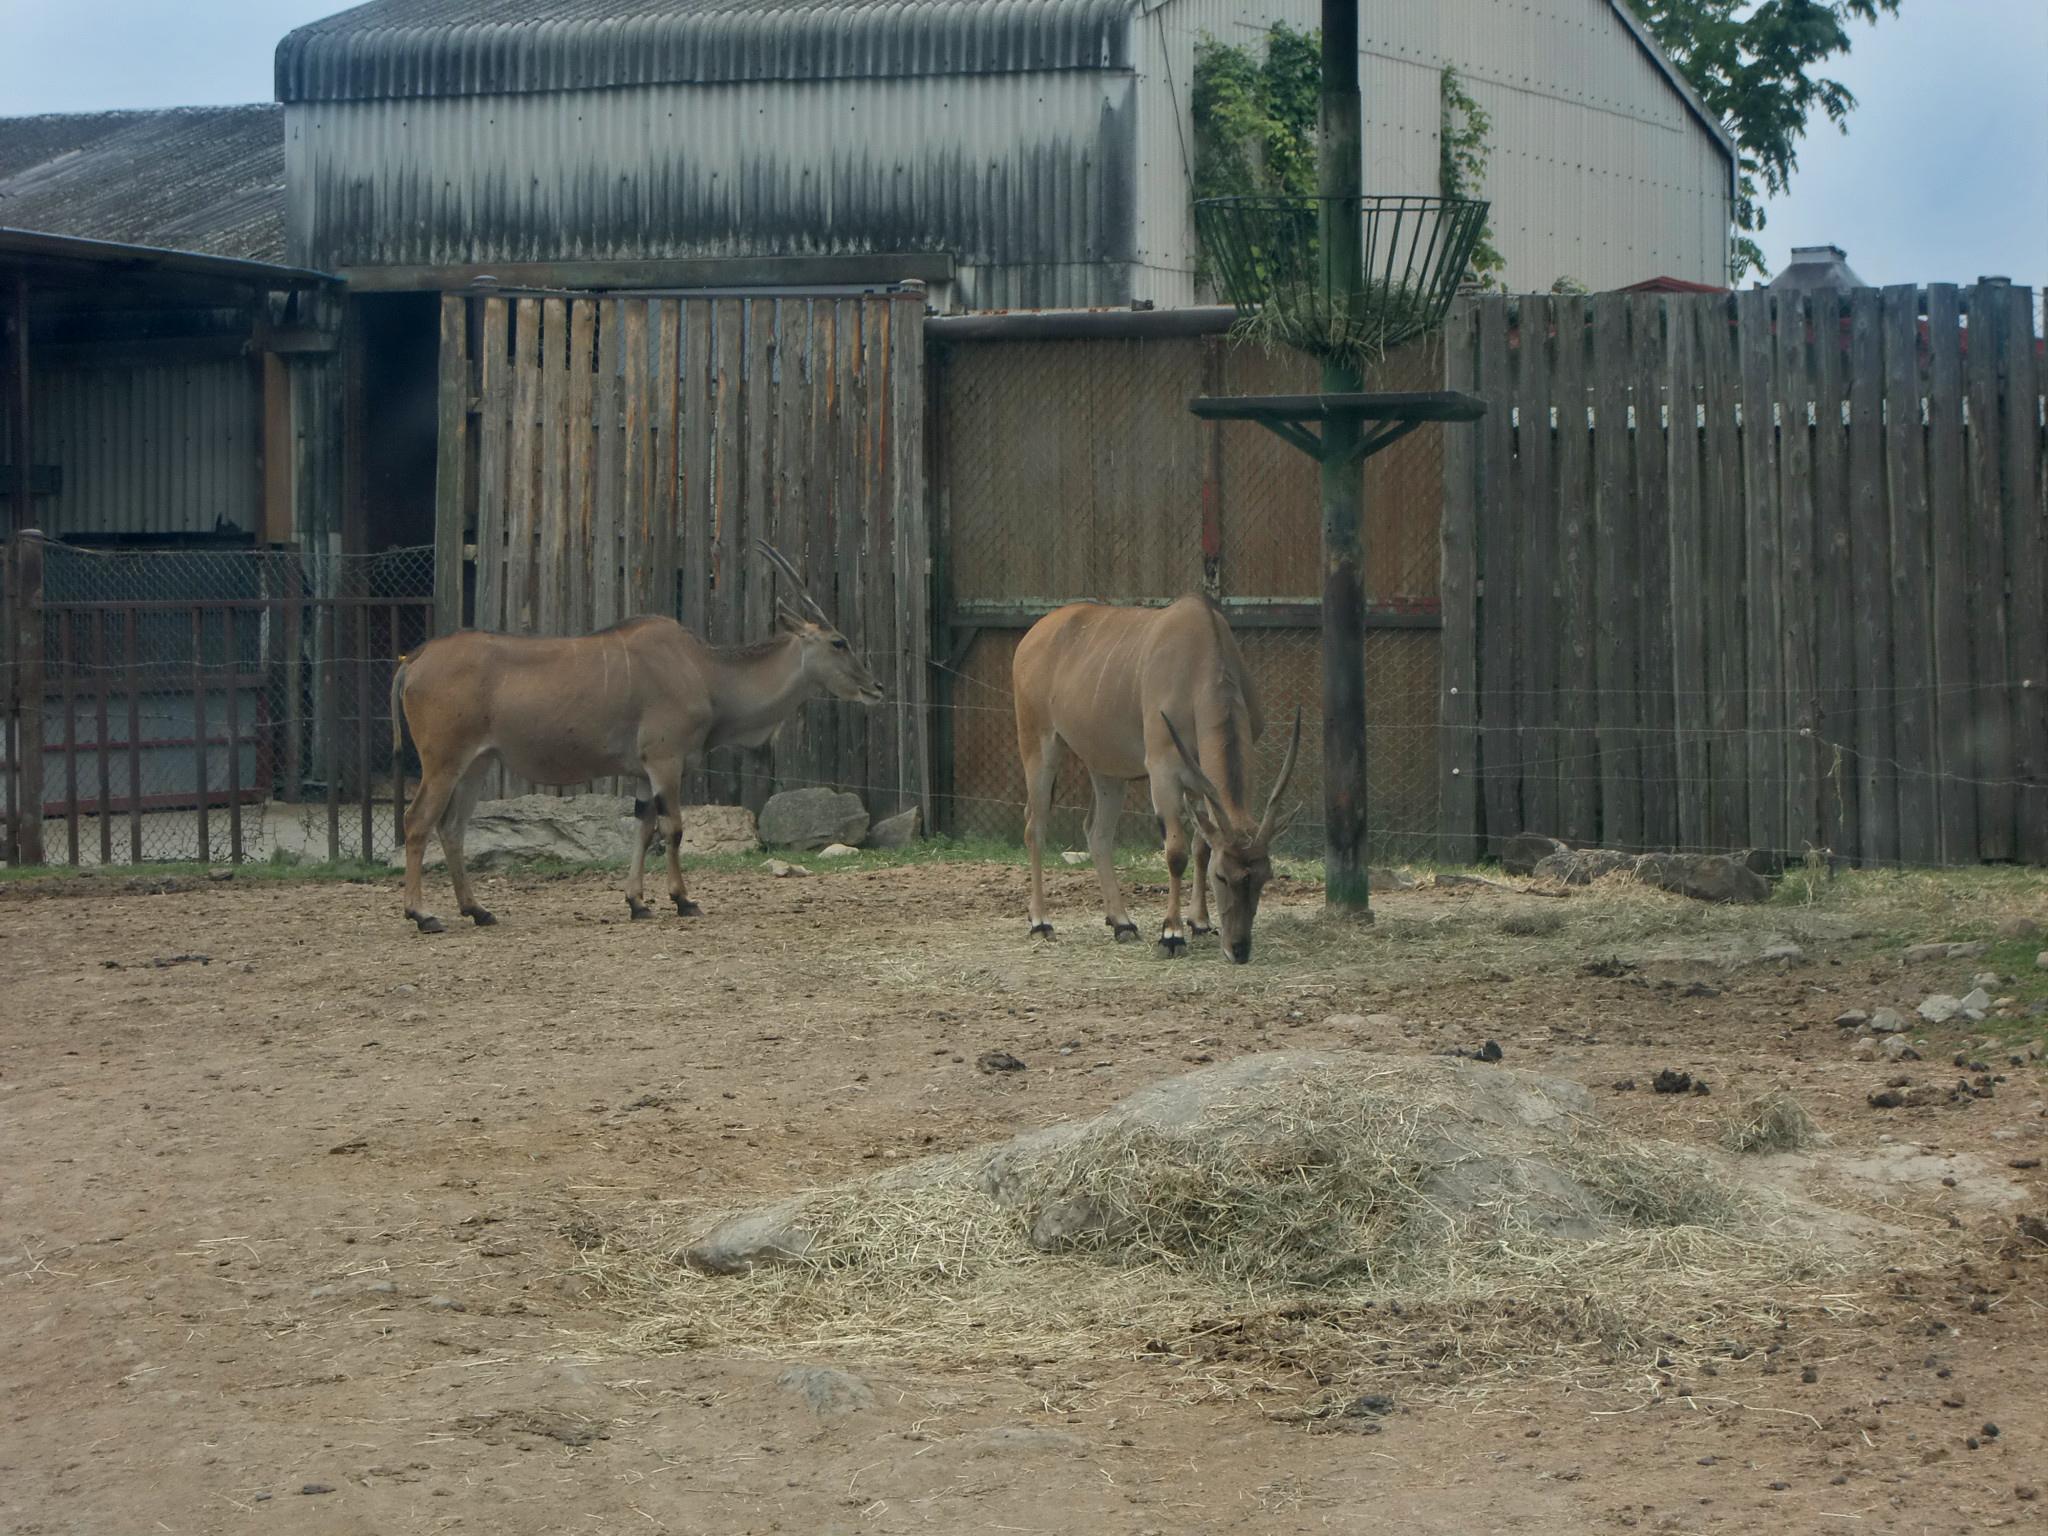 Deer, Animal, Zoo, HQ Photo